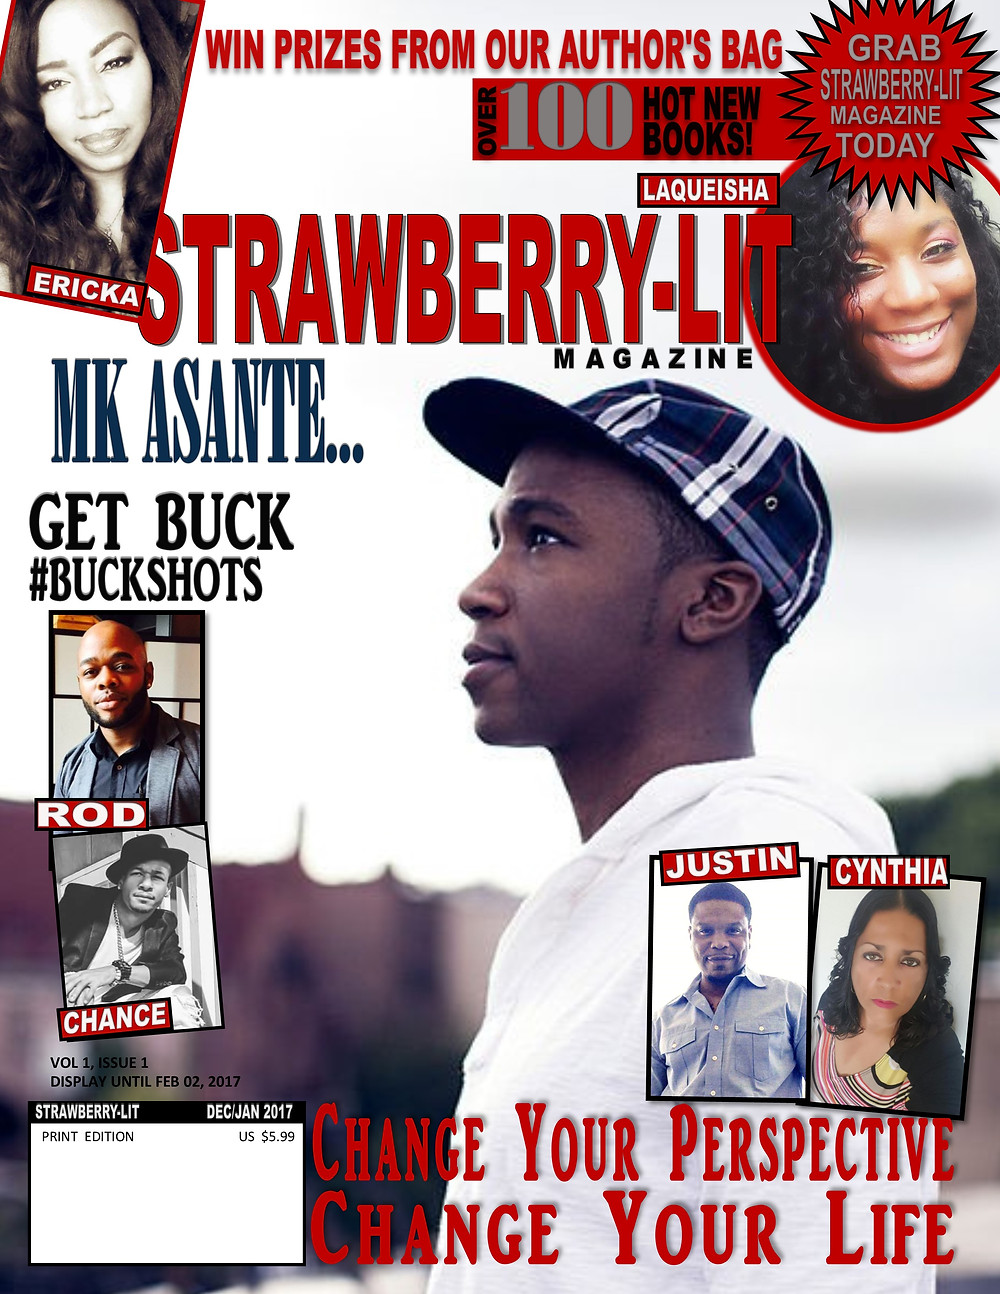 Strawbery-Lit Magazine Vol 1 Issue 1